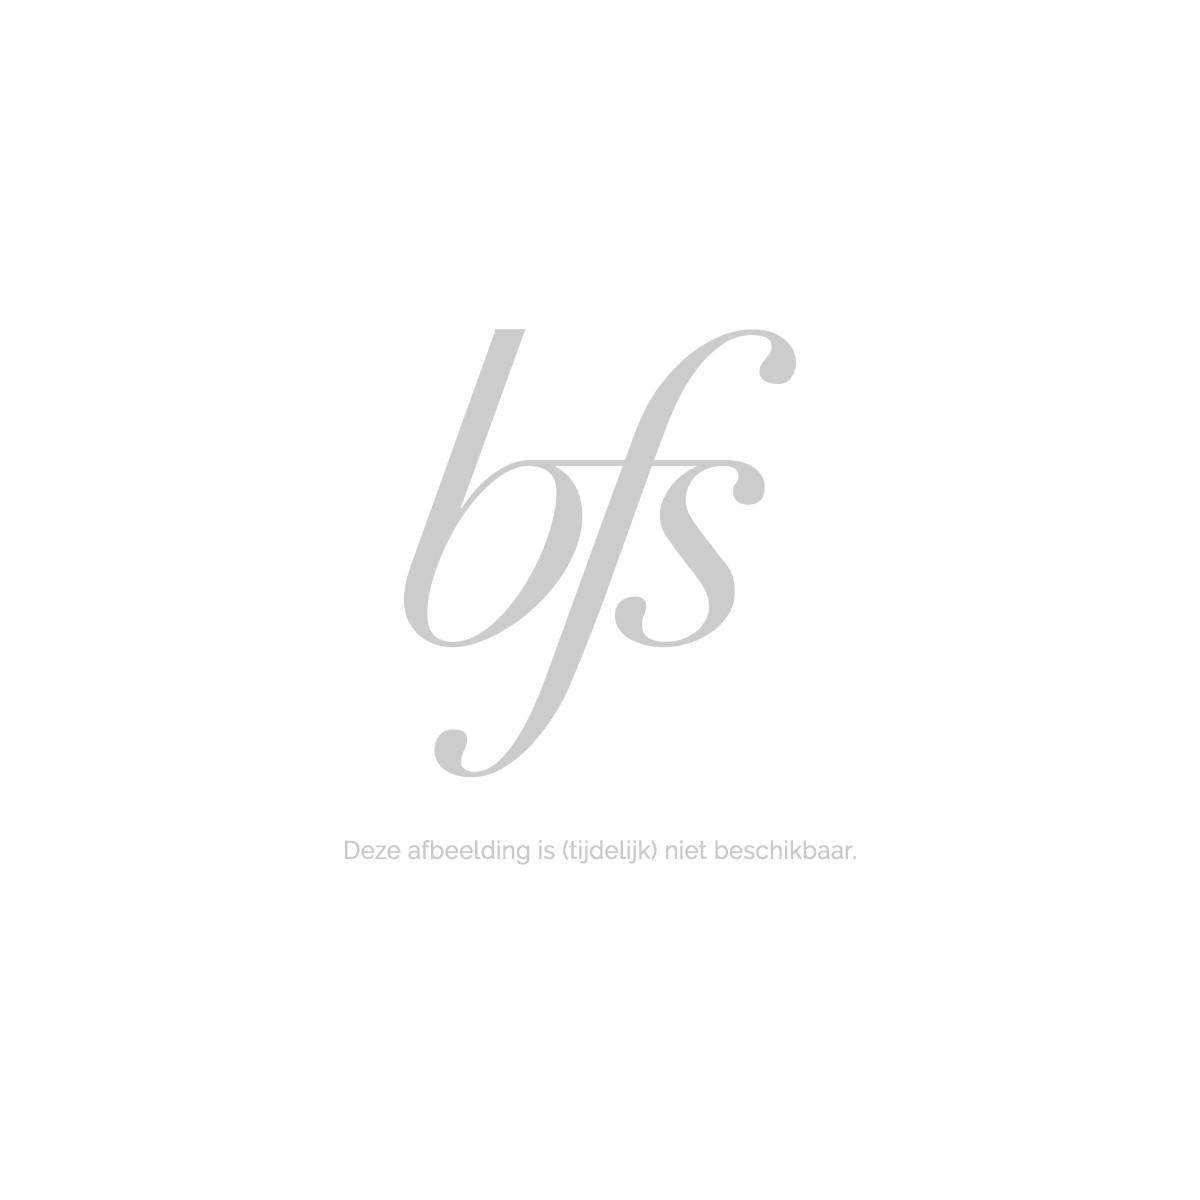 Helena Rubinstein Lash Queen Feline Blacks Waterproof Mascara 7,20 Ml